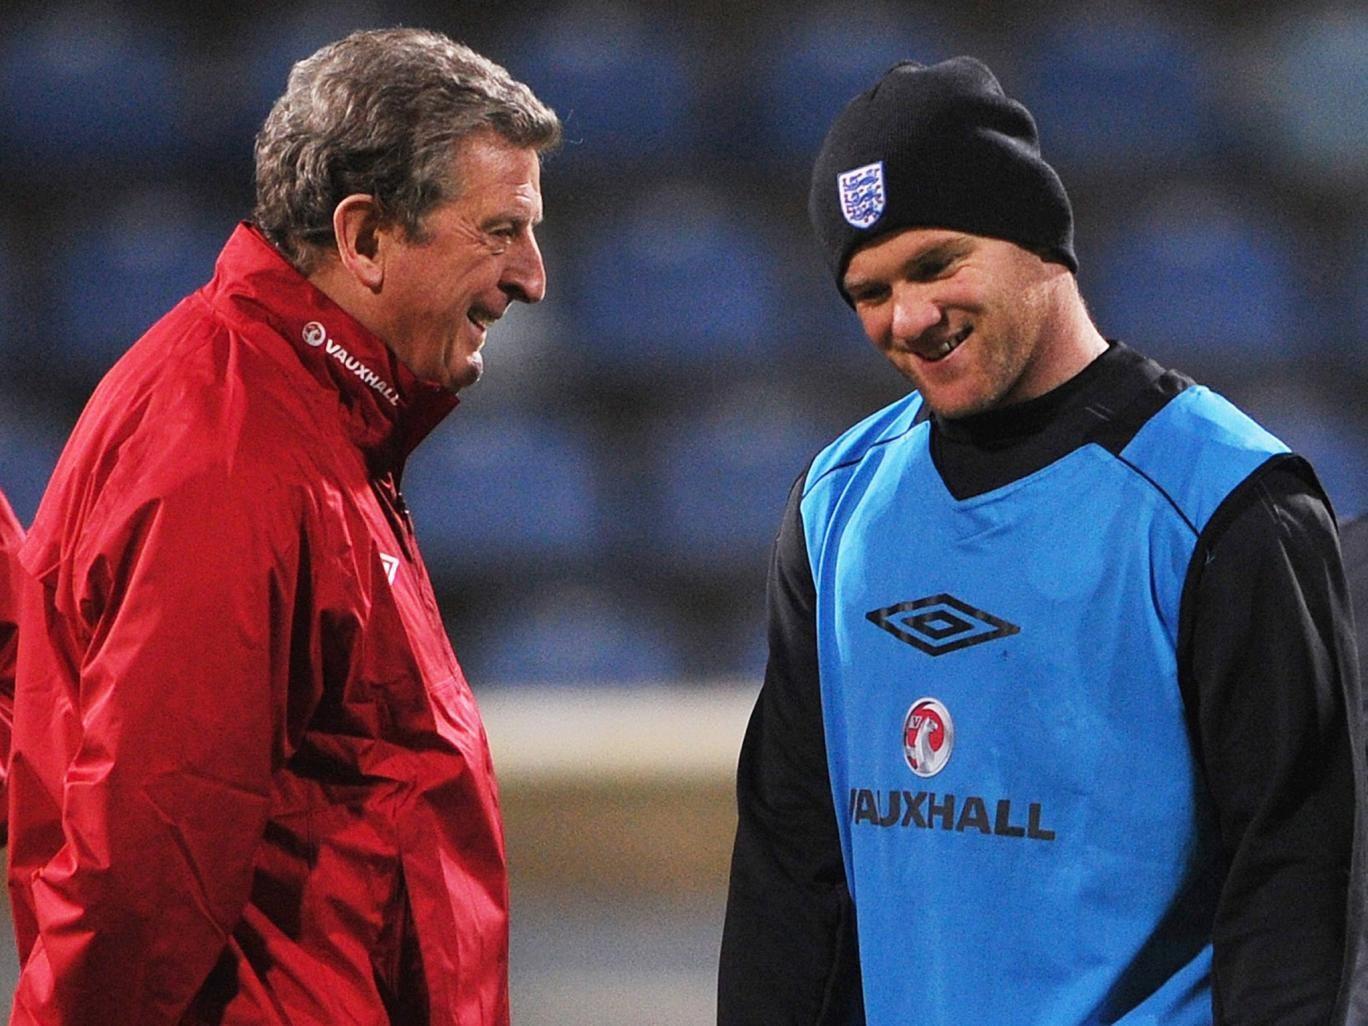 Roy Hodgson talks to Wayne Rooney